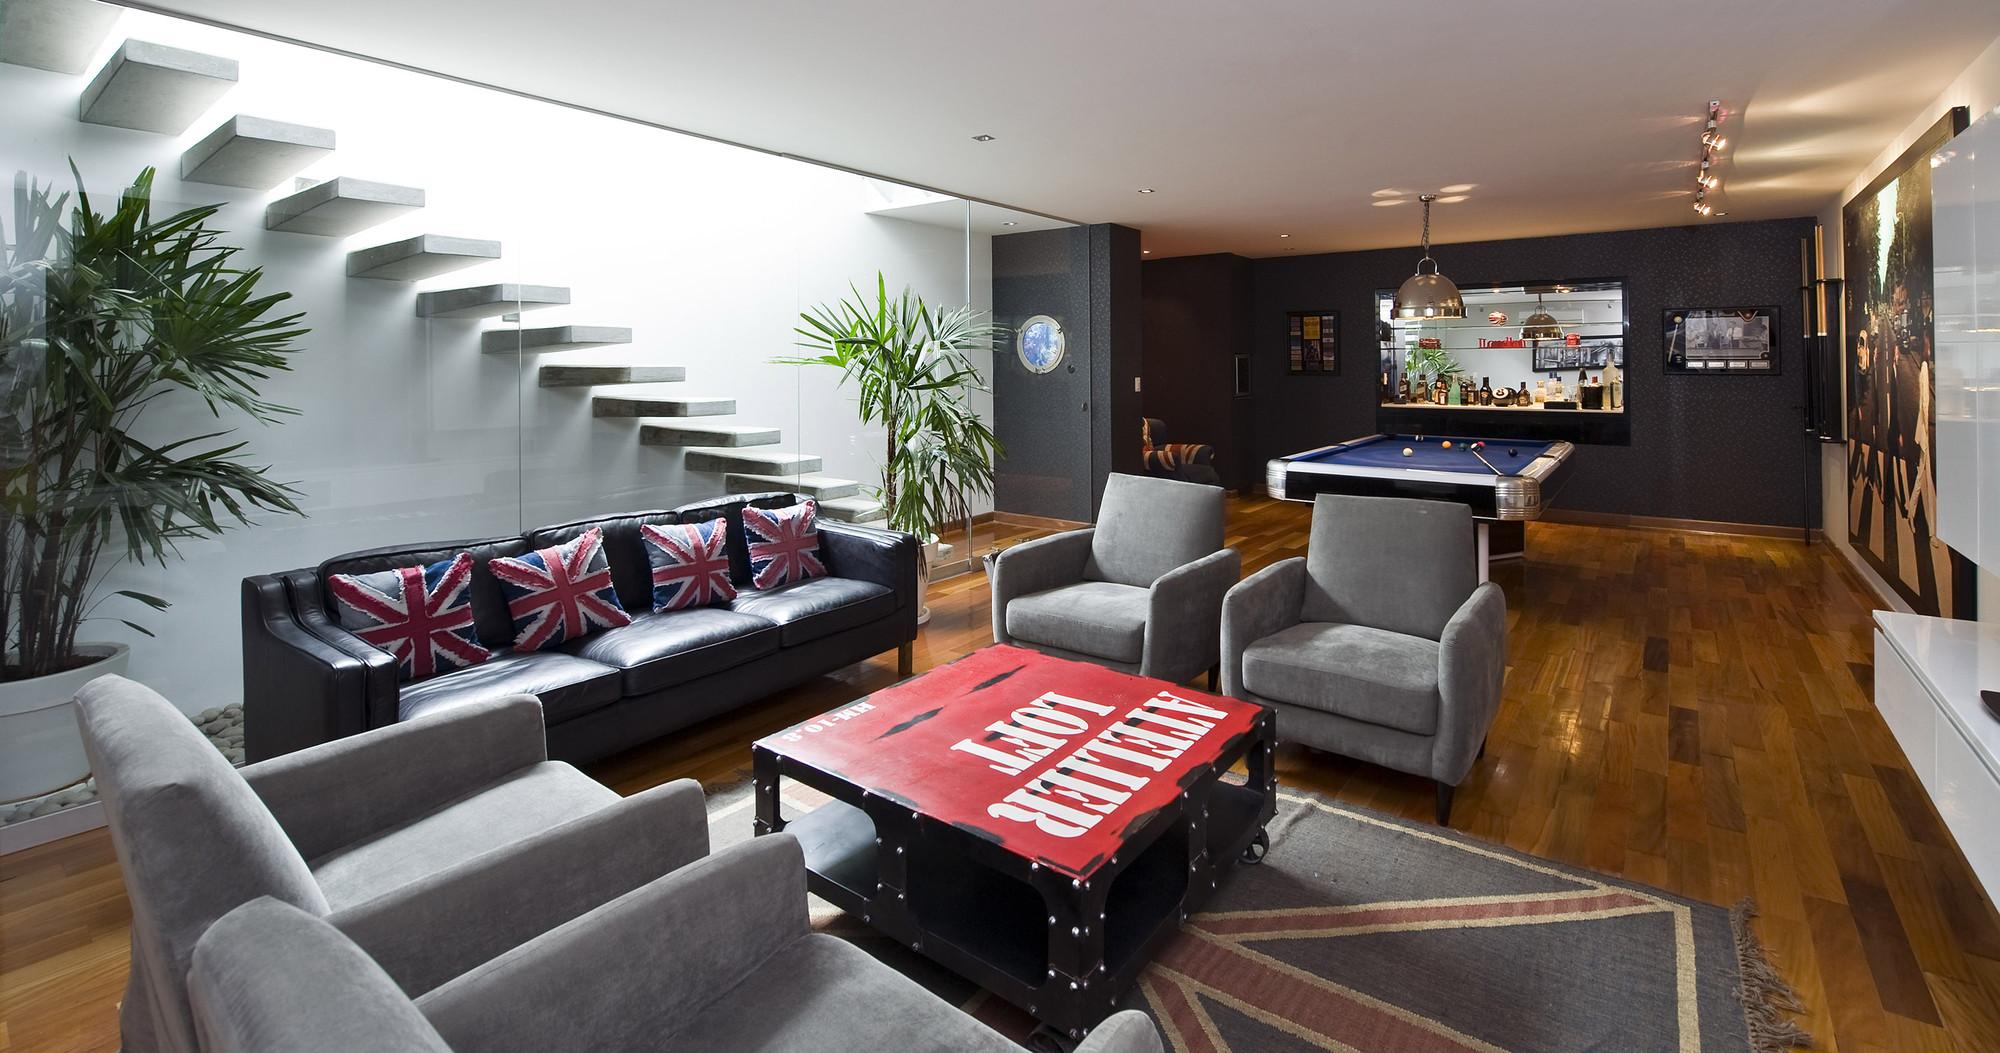 Galeria de casa v estudio 6 arquitectos 3 - Estudio 3 arquitectos ...